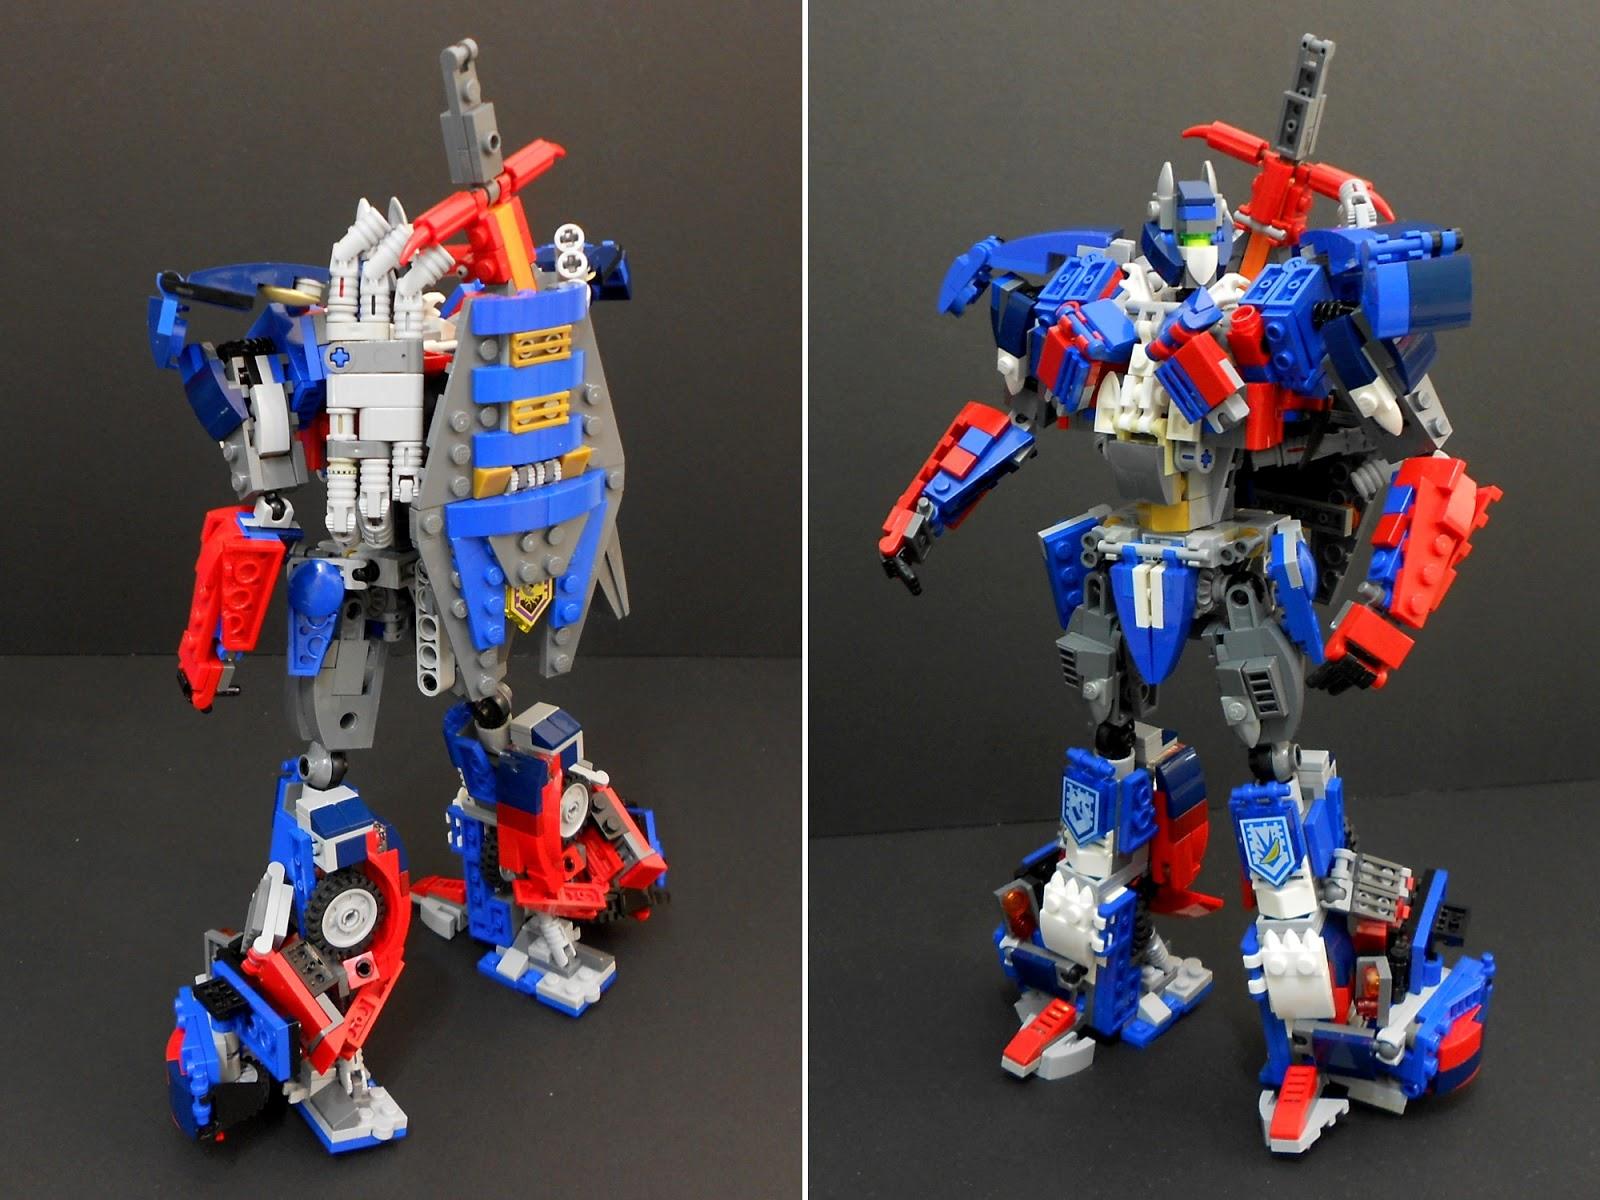 Alanyuppie S Lego Transformers Lego The Last Knight